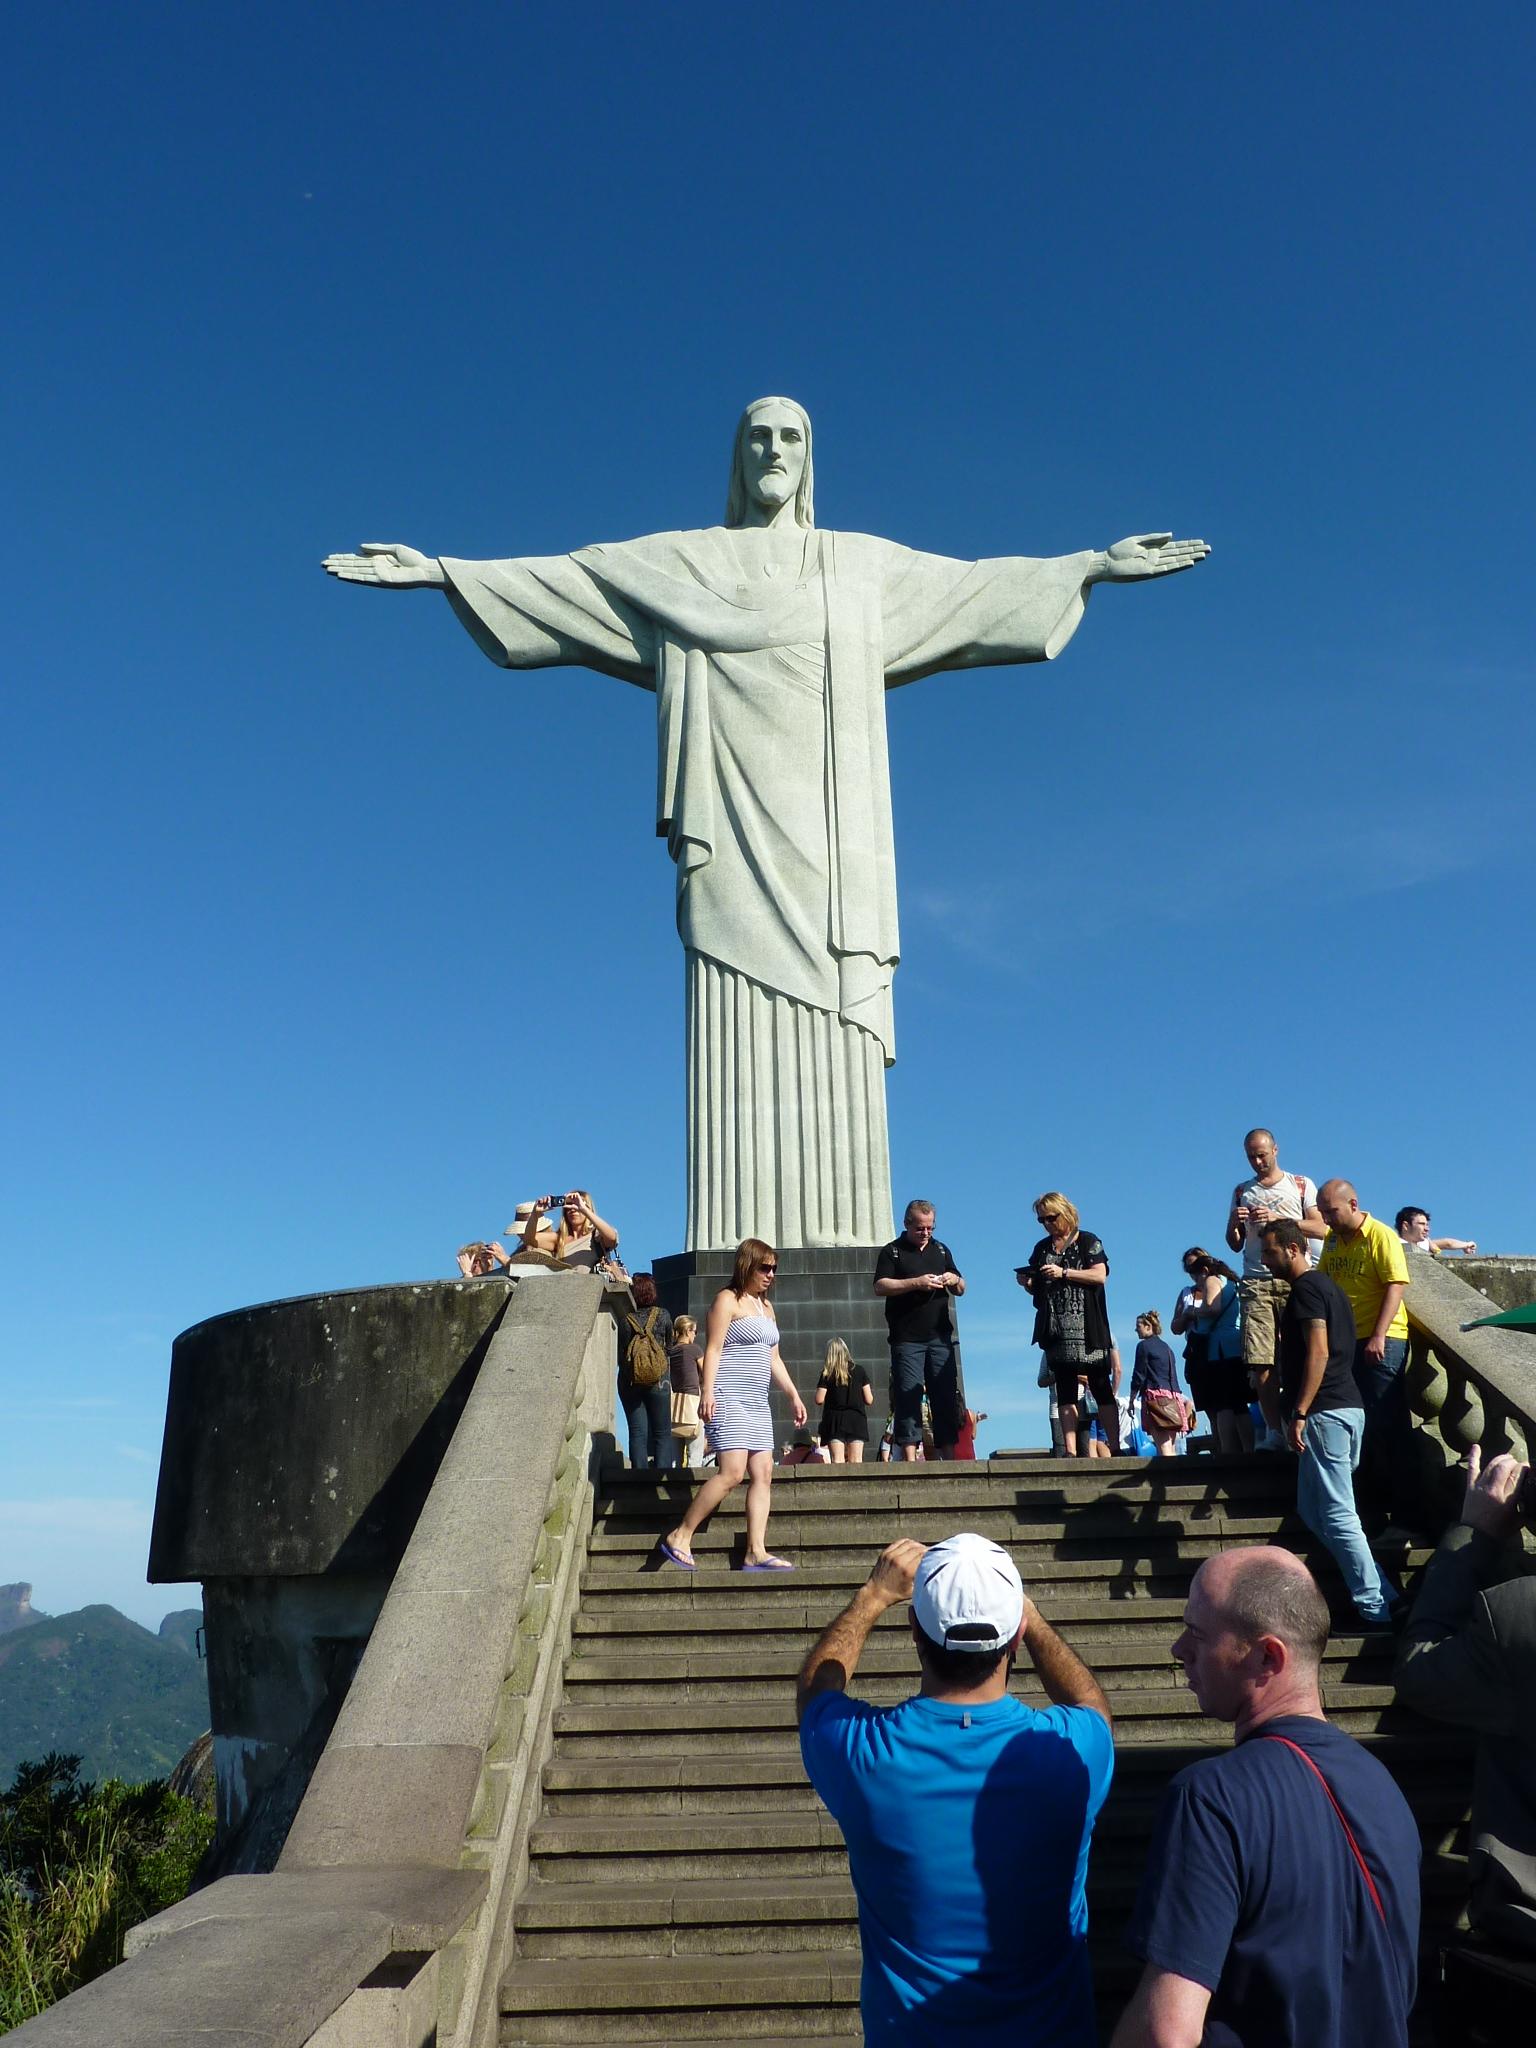 Christ The Redeemer : Part days in rio de janeiro brazil day beam me